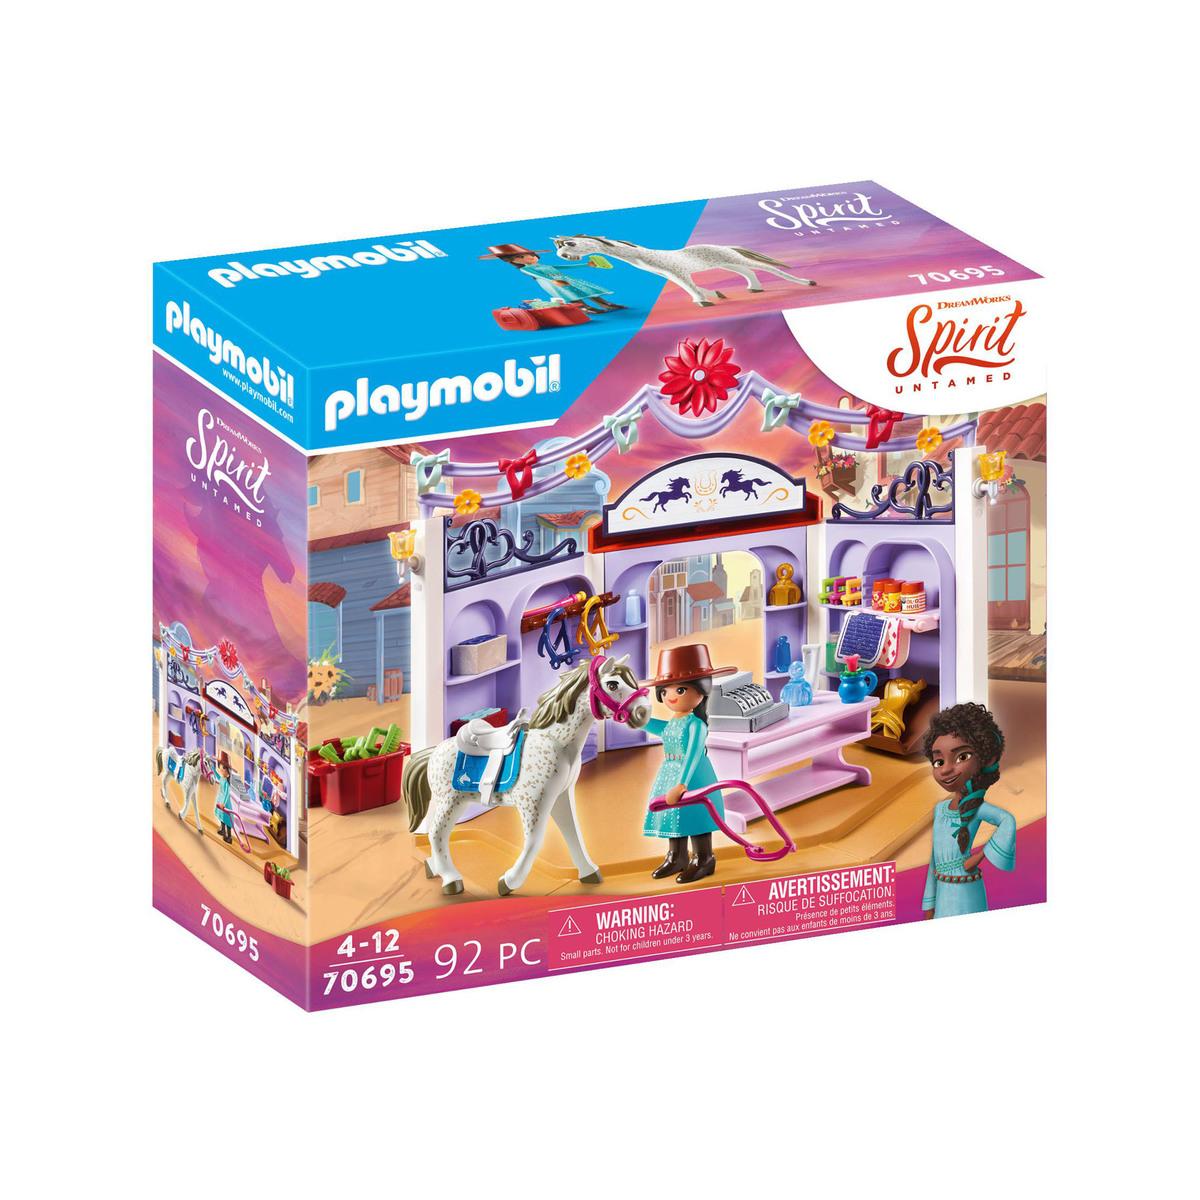 Playmobil 70695 Dreamworks Spirit Untamed Miradero Tack Shop Playset